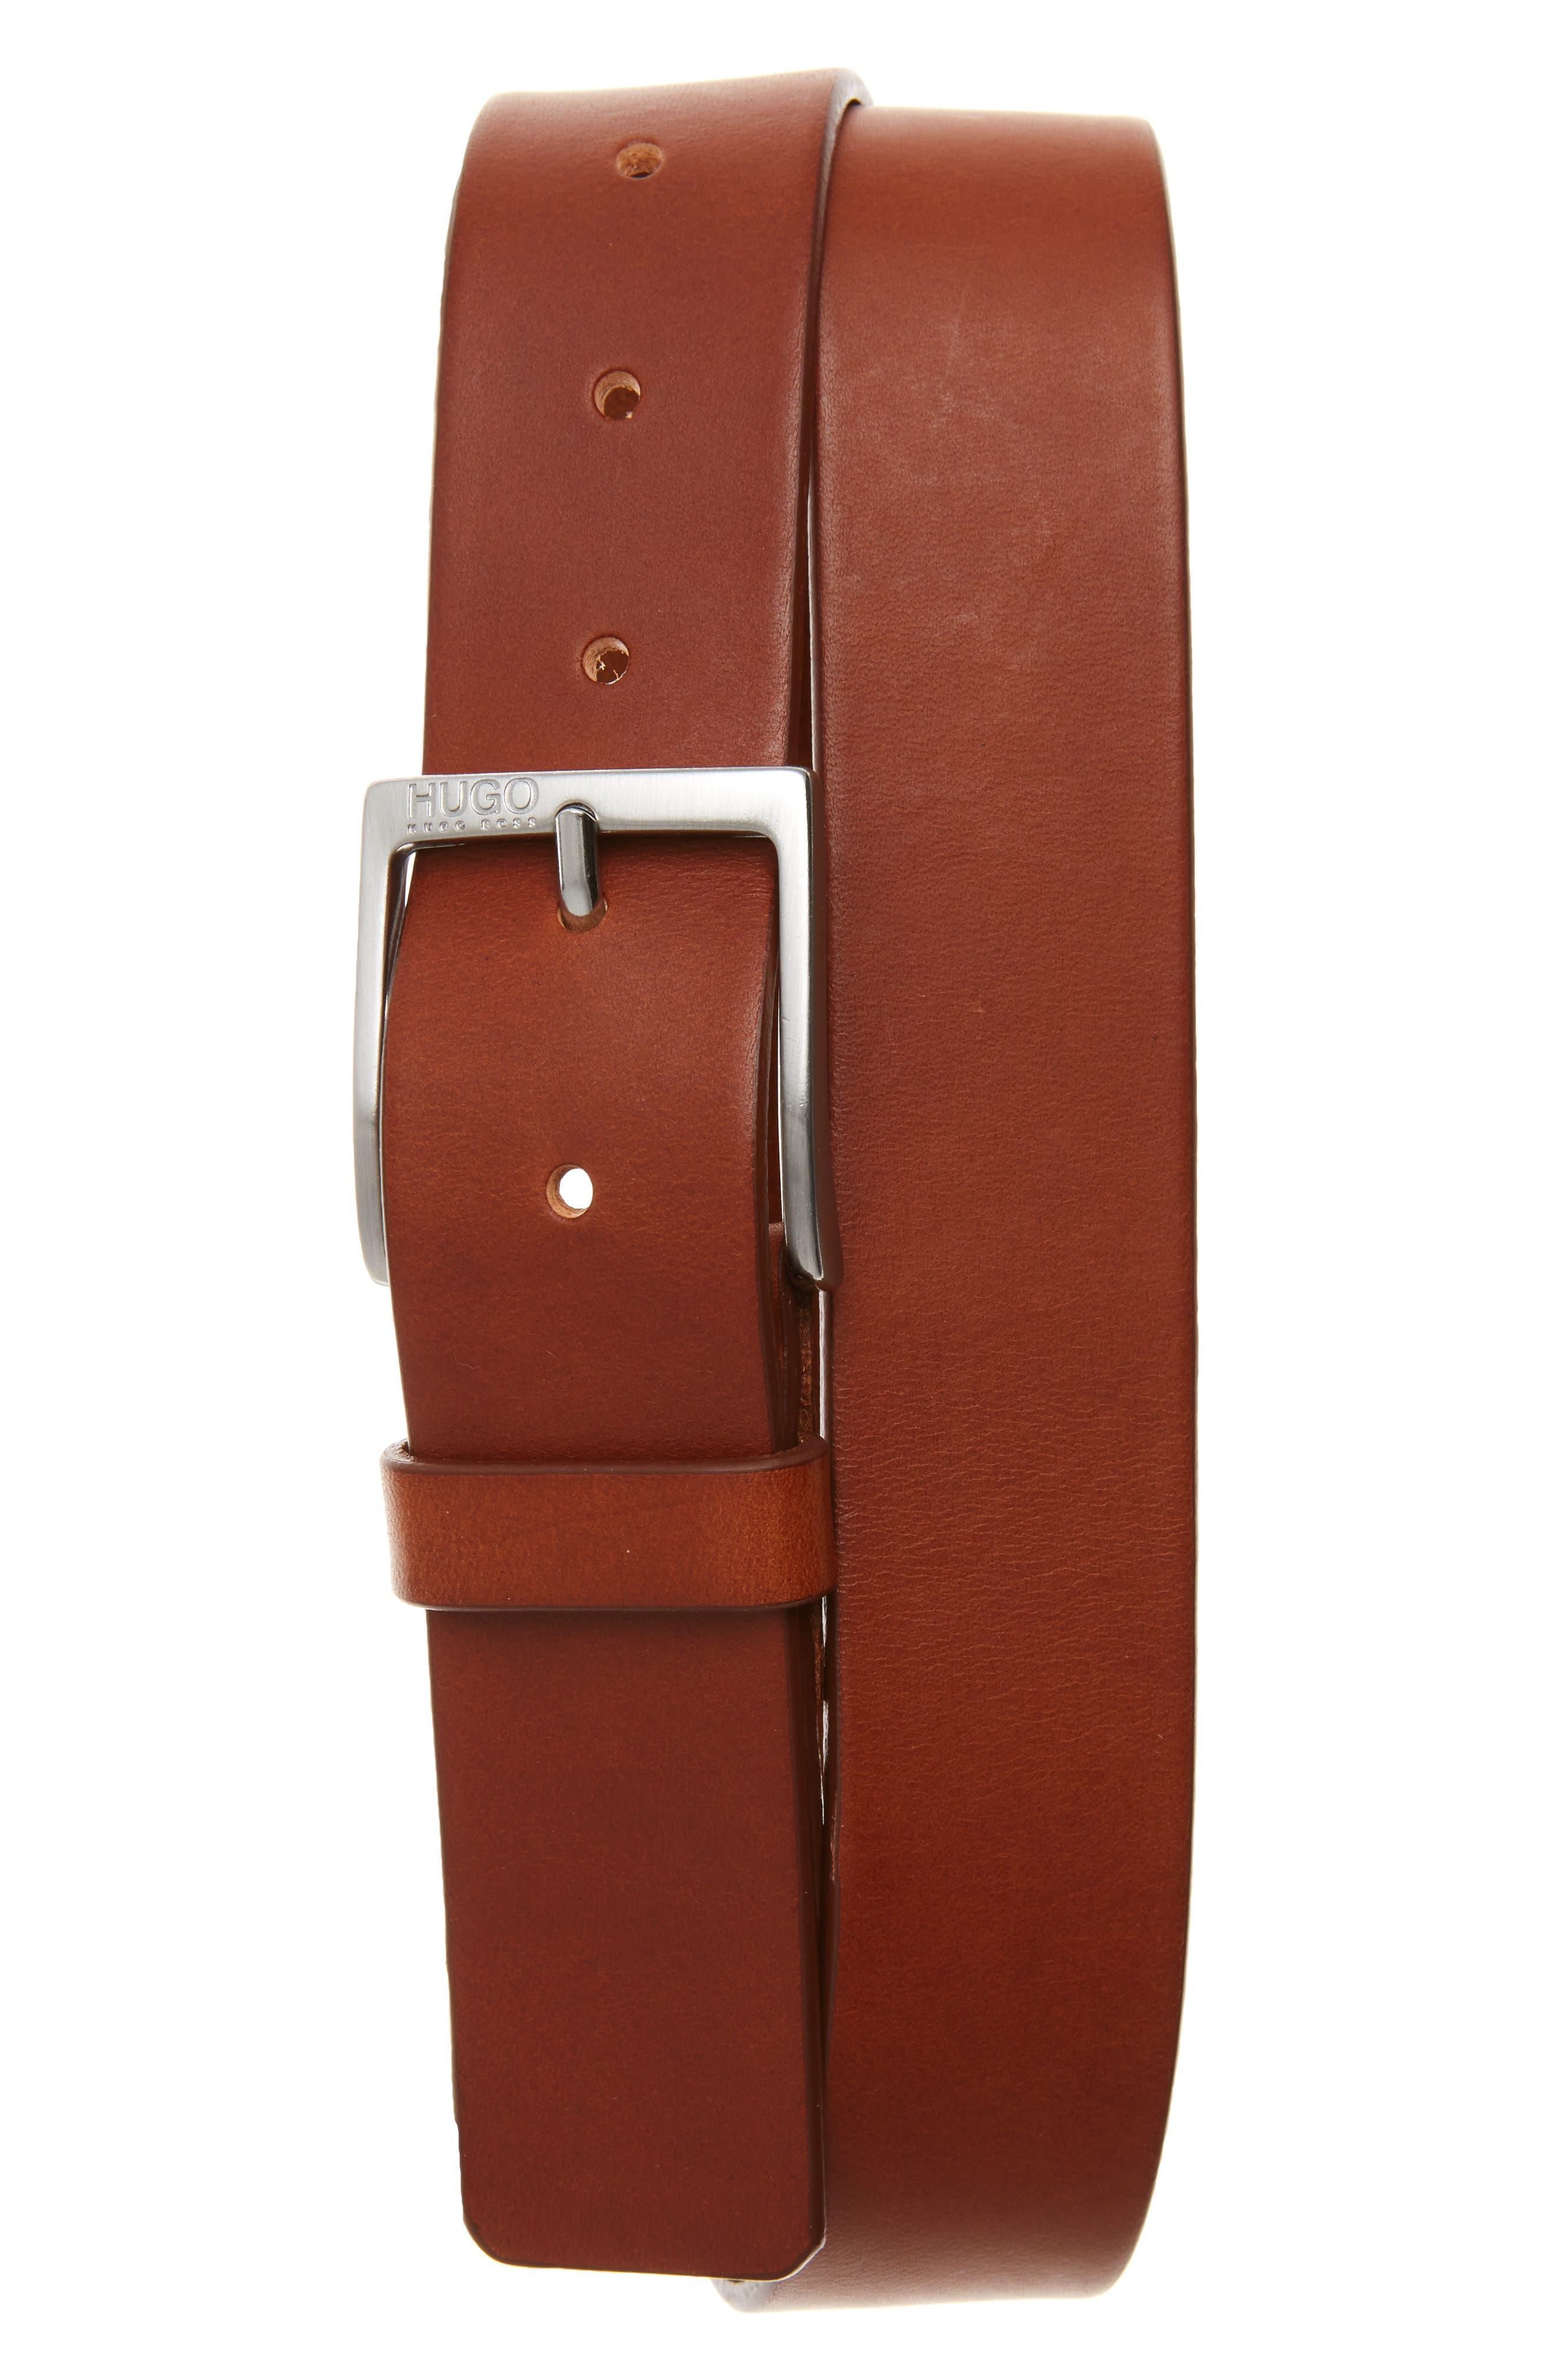 BOSS C-Gem Leather Belt